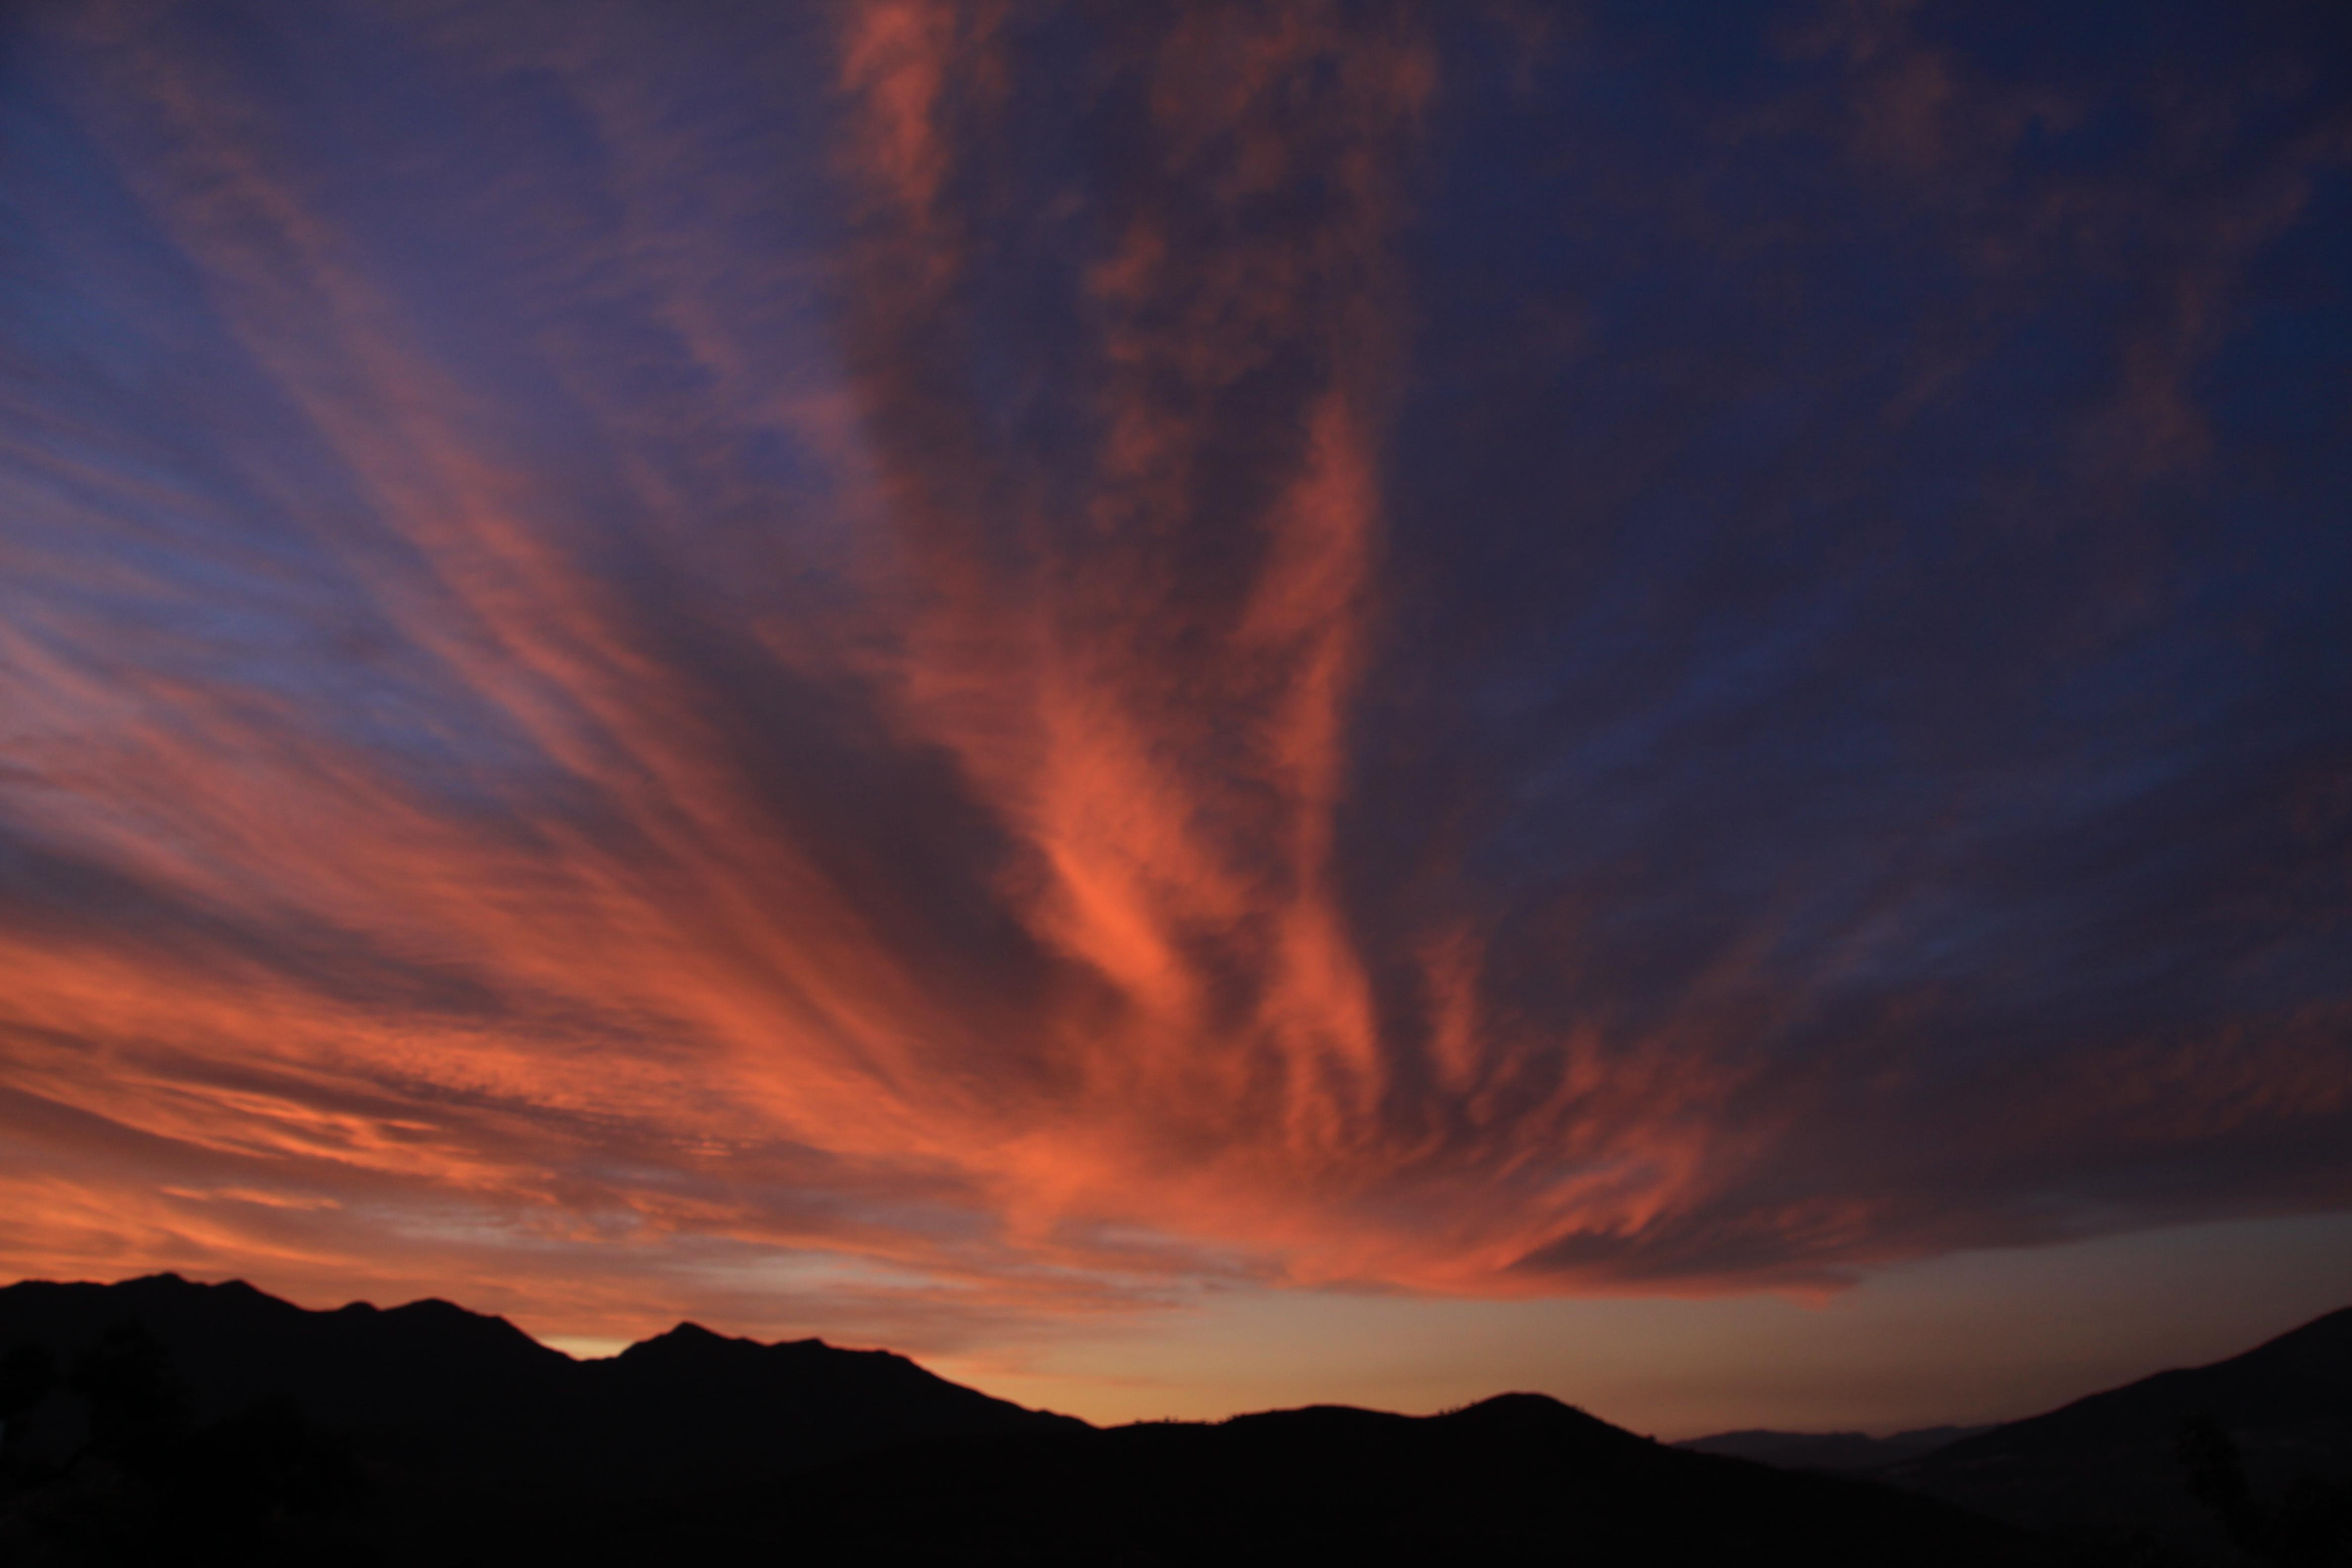 Sunset at La Mairena